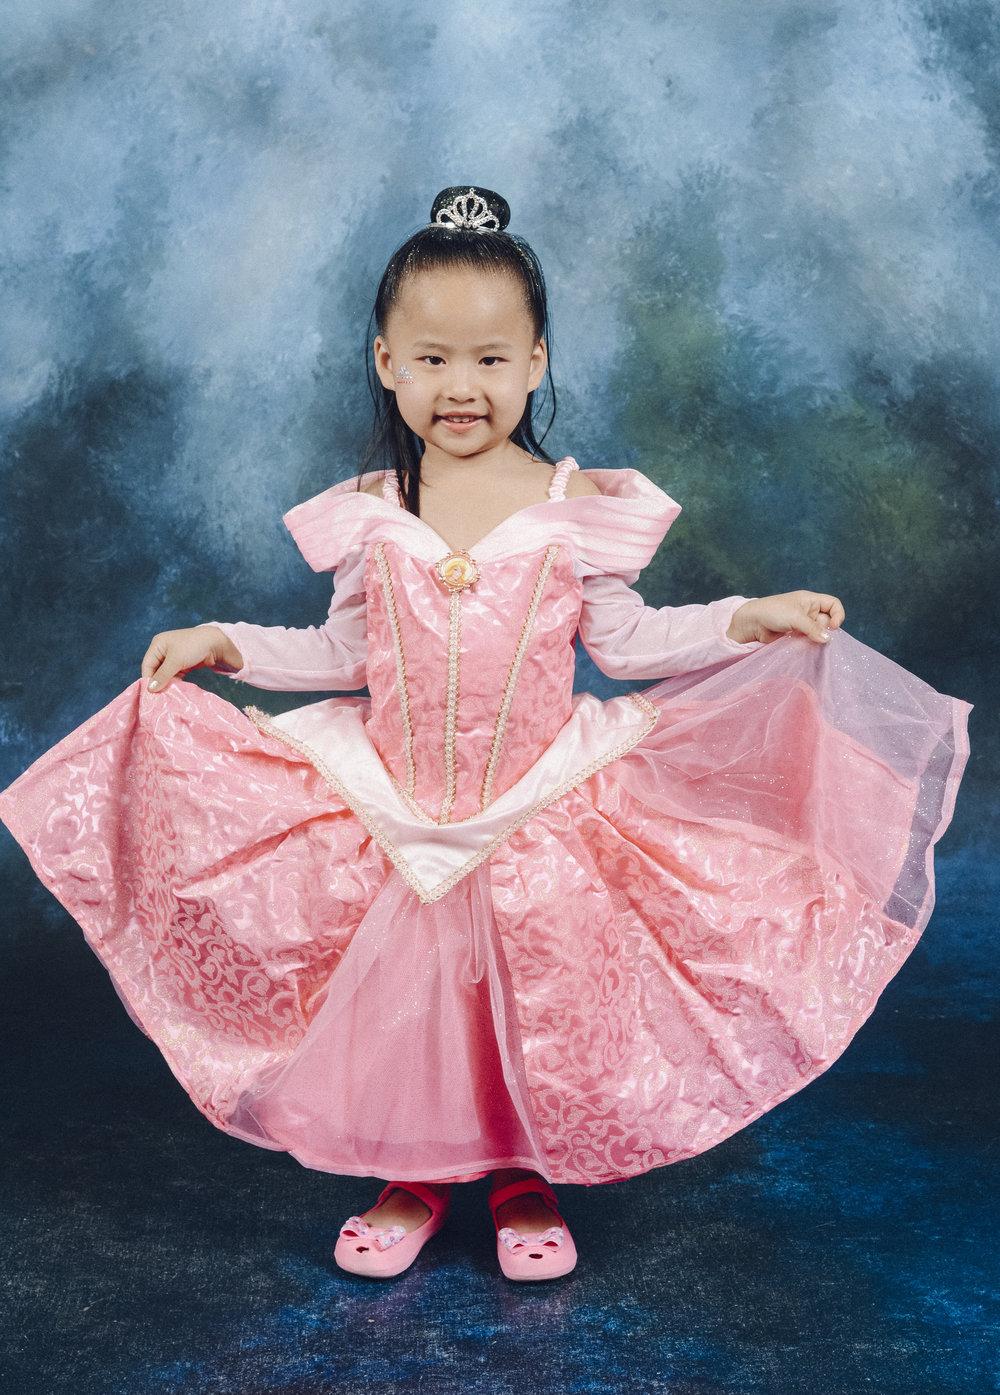 olivia_dress2.jpg